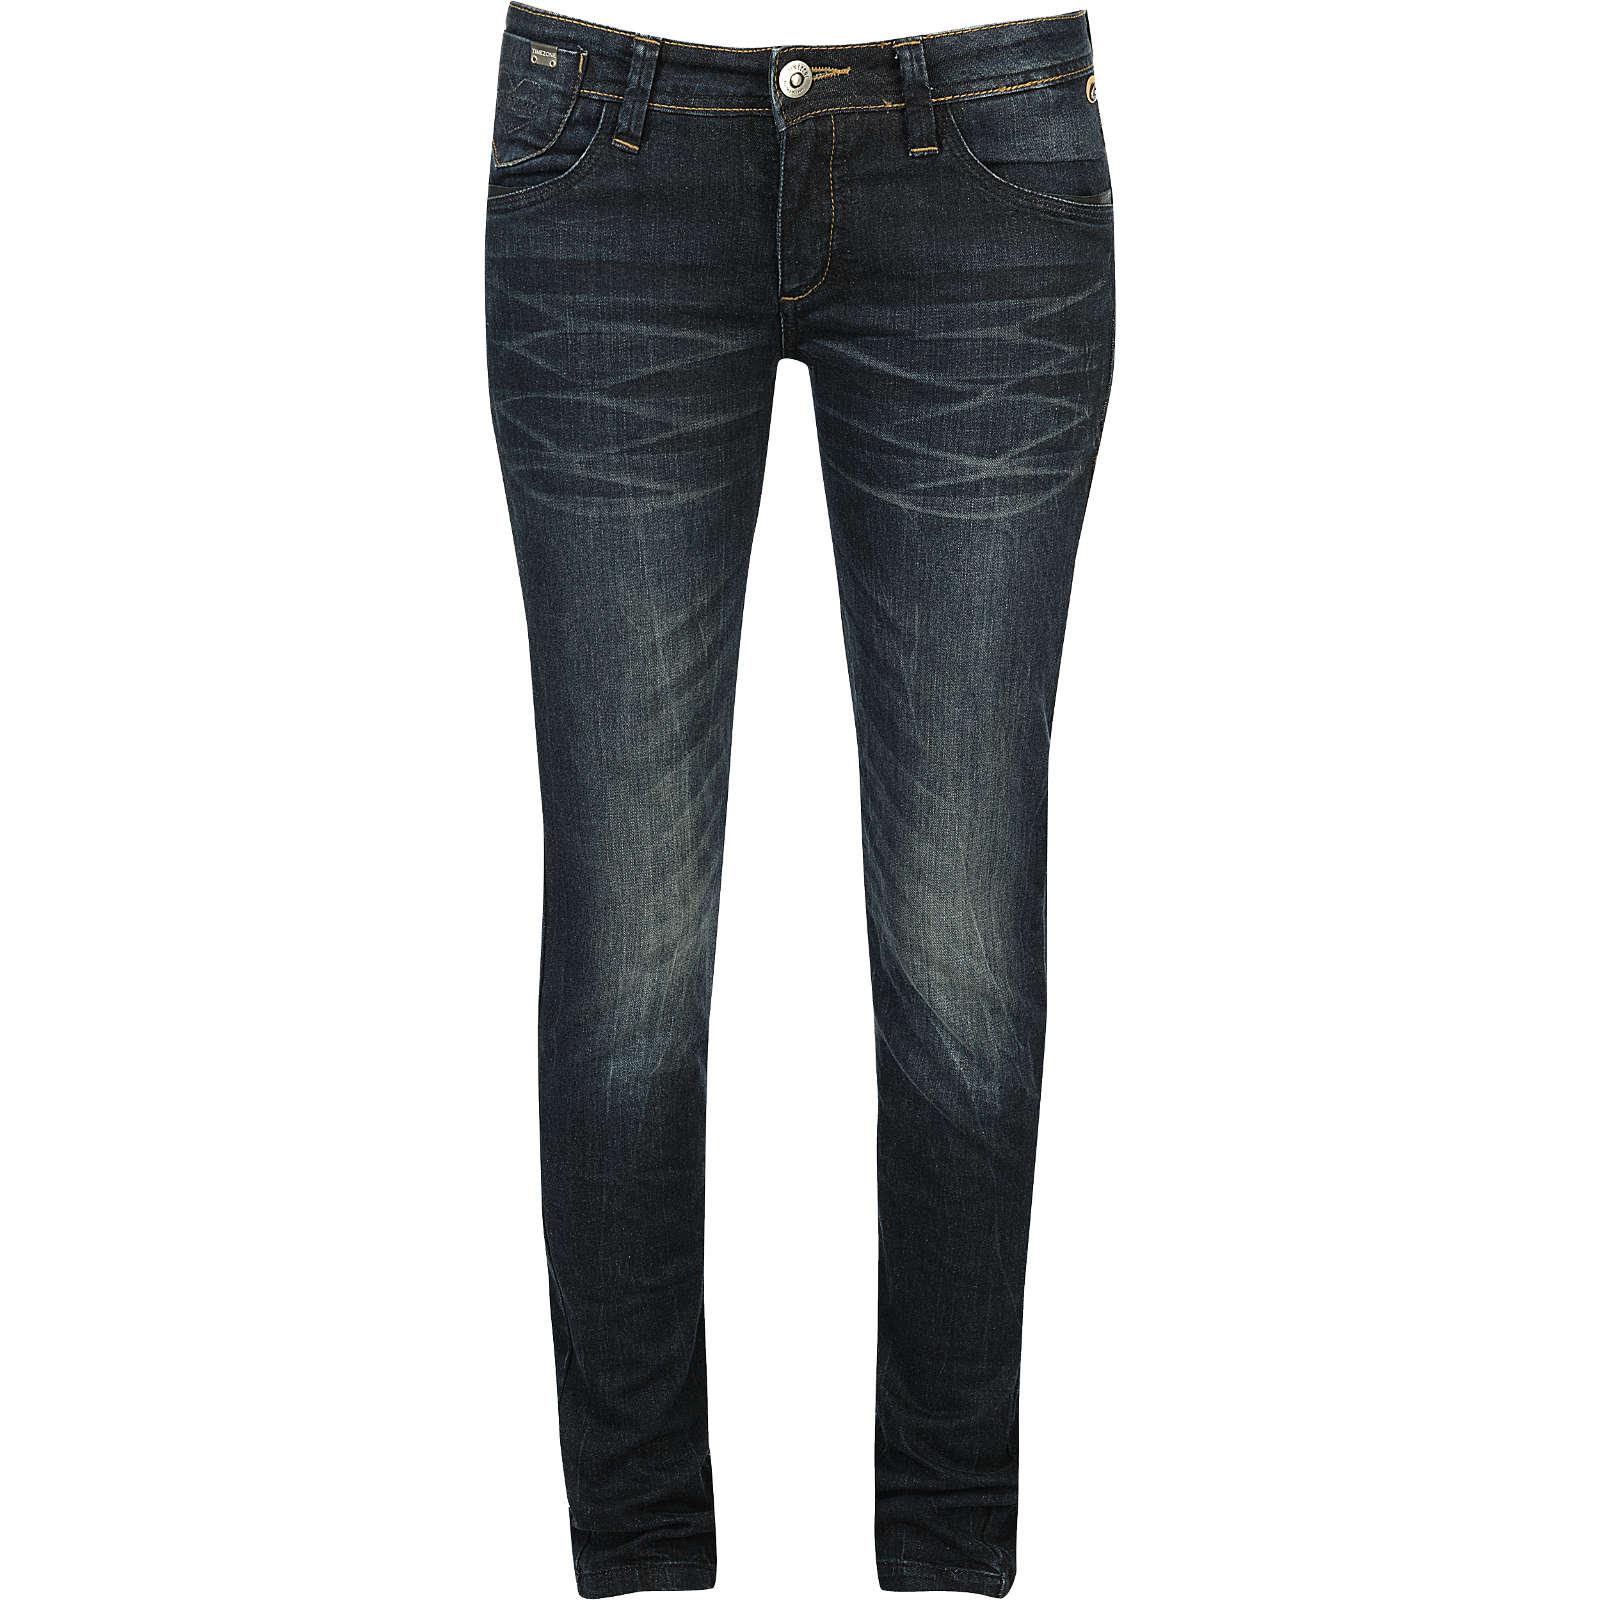 TIMEZONE Jeans Emilia Straight dark blue denim Damen Gr. W27/L32